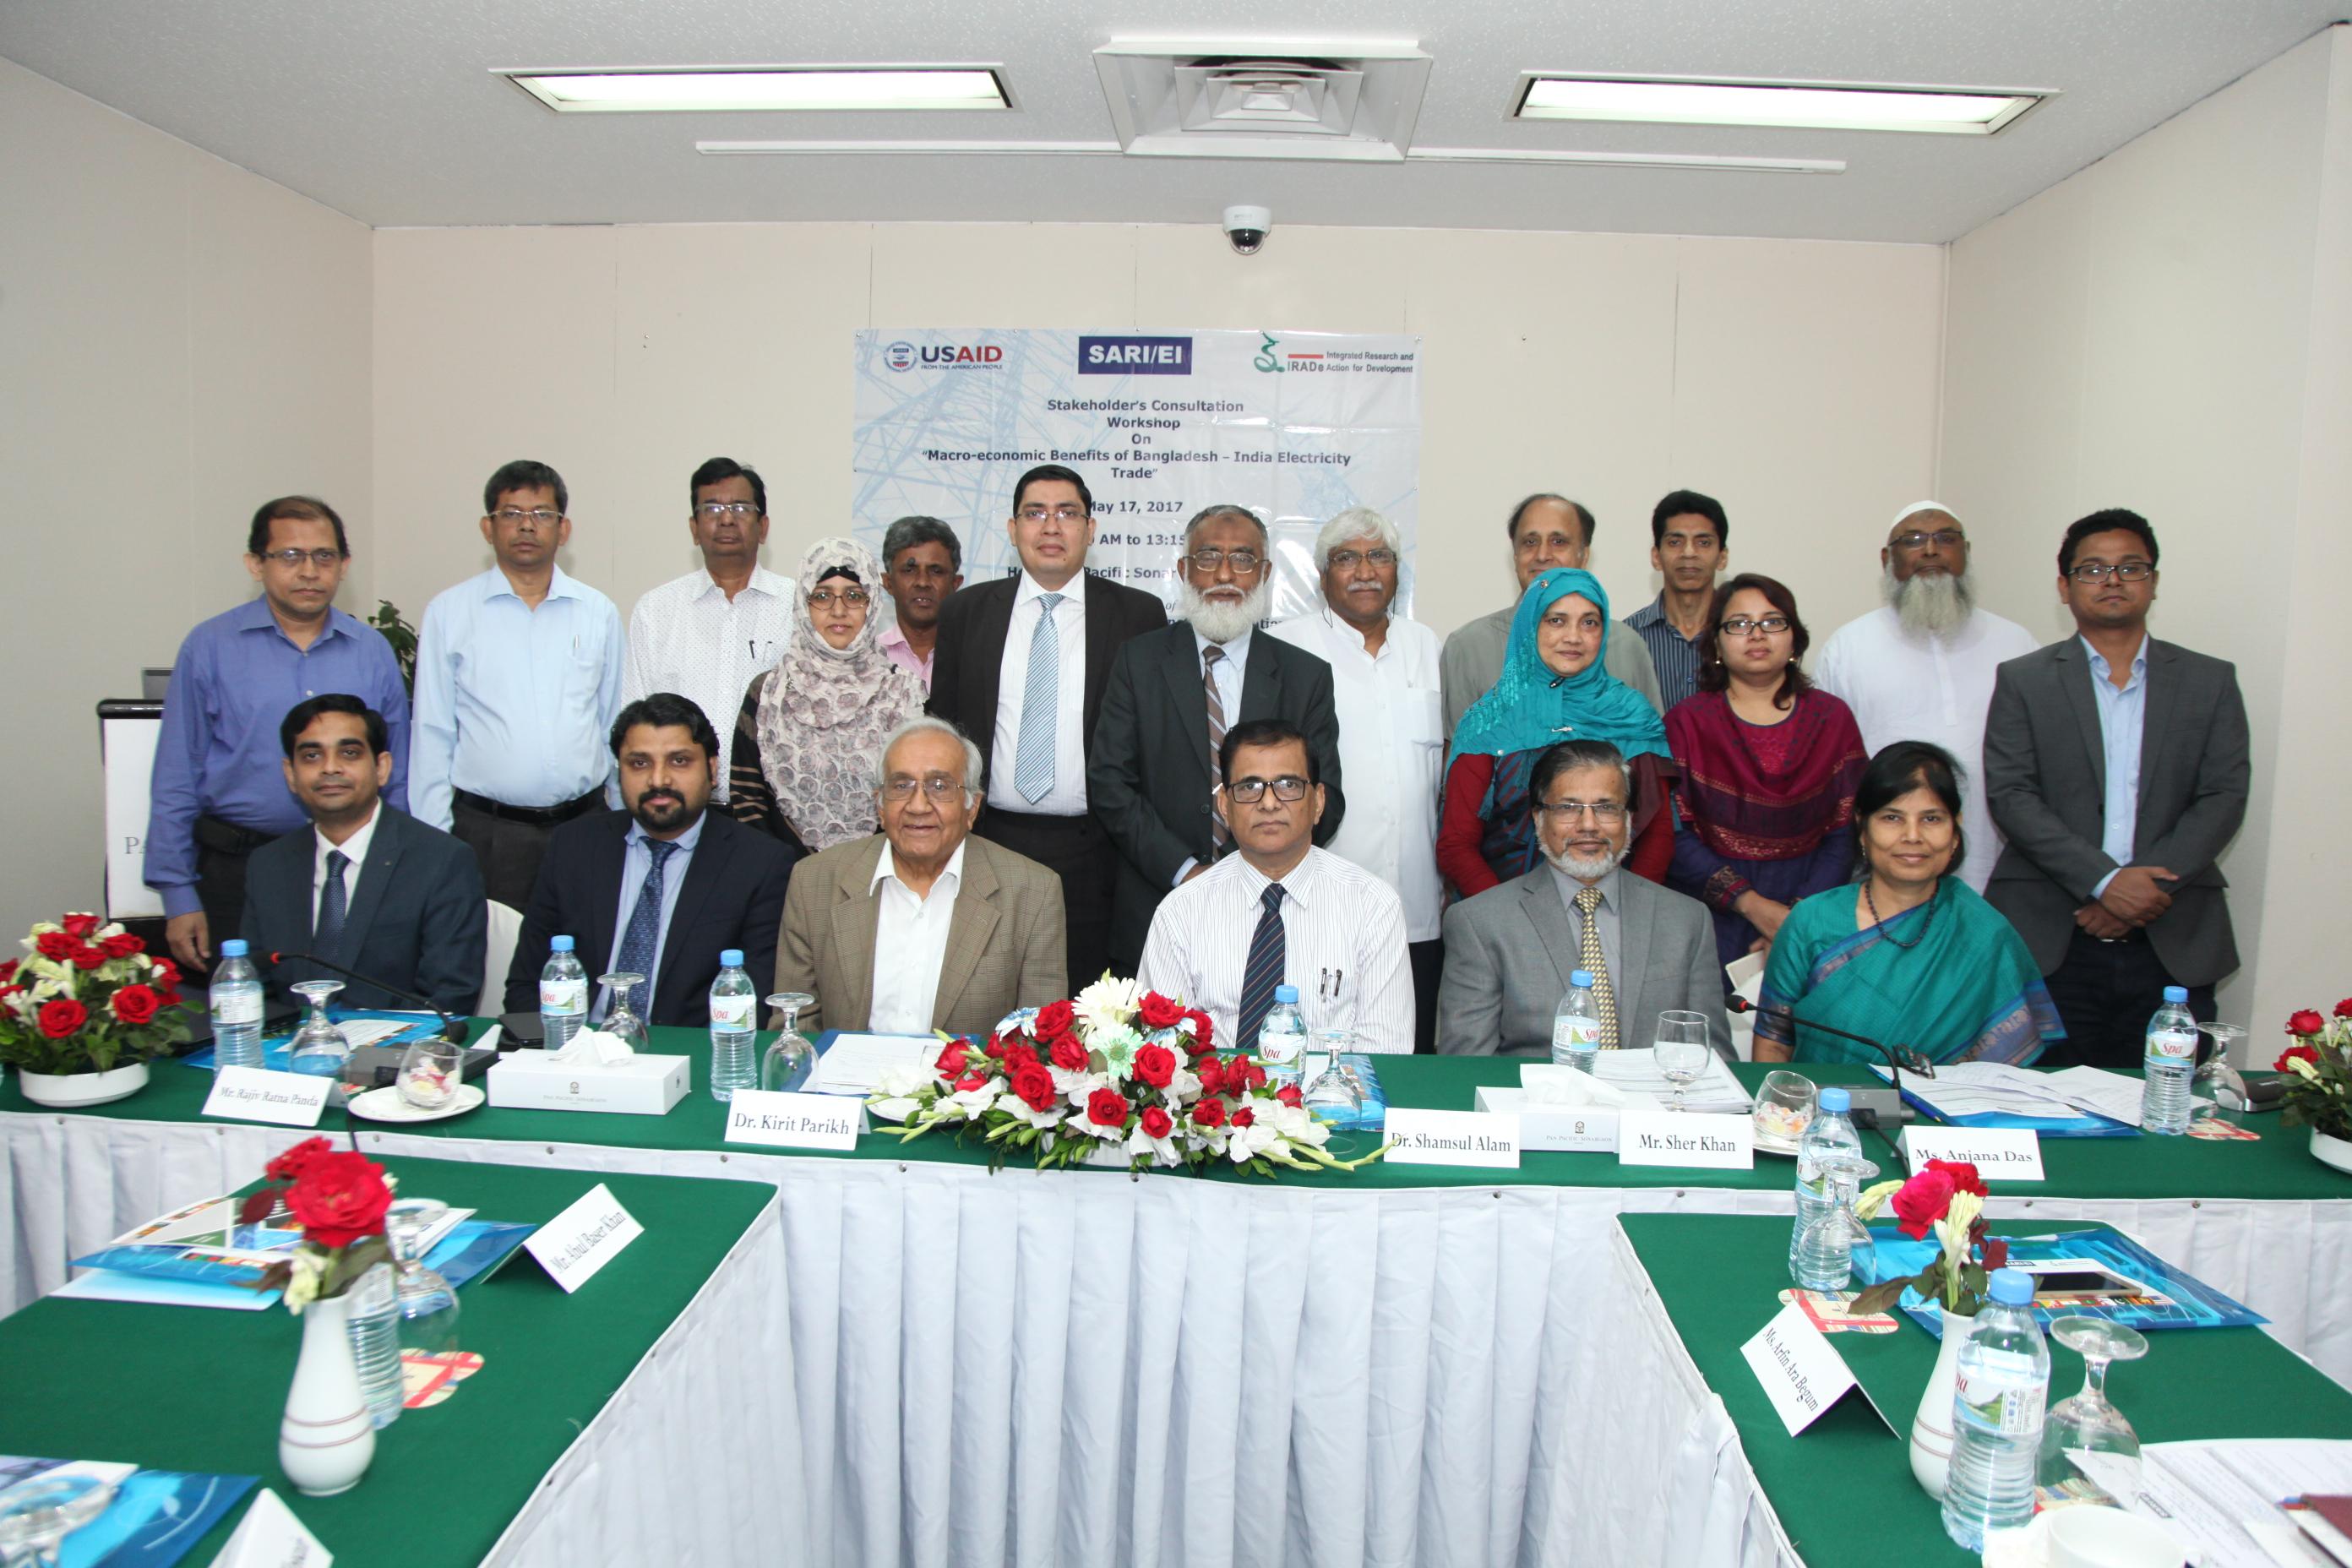 Final Stakeholder's Consultation Workshop On Macro-Economic Benefits of Bangladesh – India electricity trade  17th May, 2017 Chitra Hall, Hotel Pan Pacific Sonar Gaon, Dhaka, Bangladesh